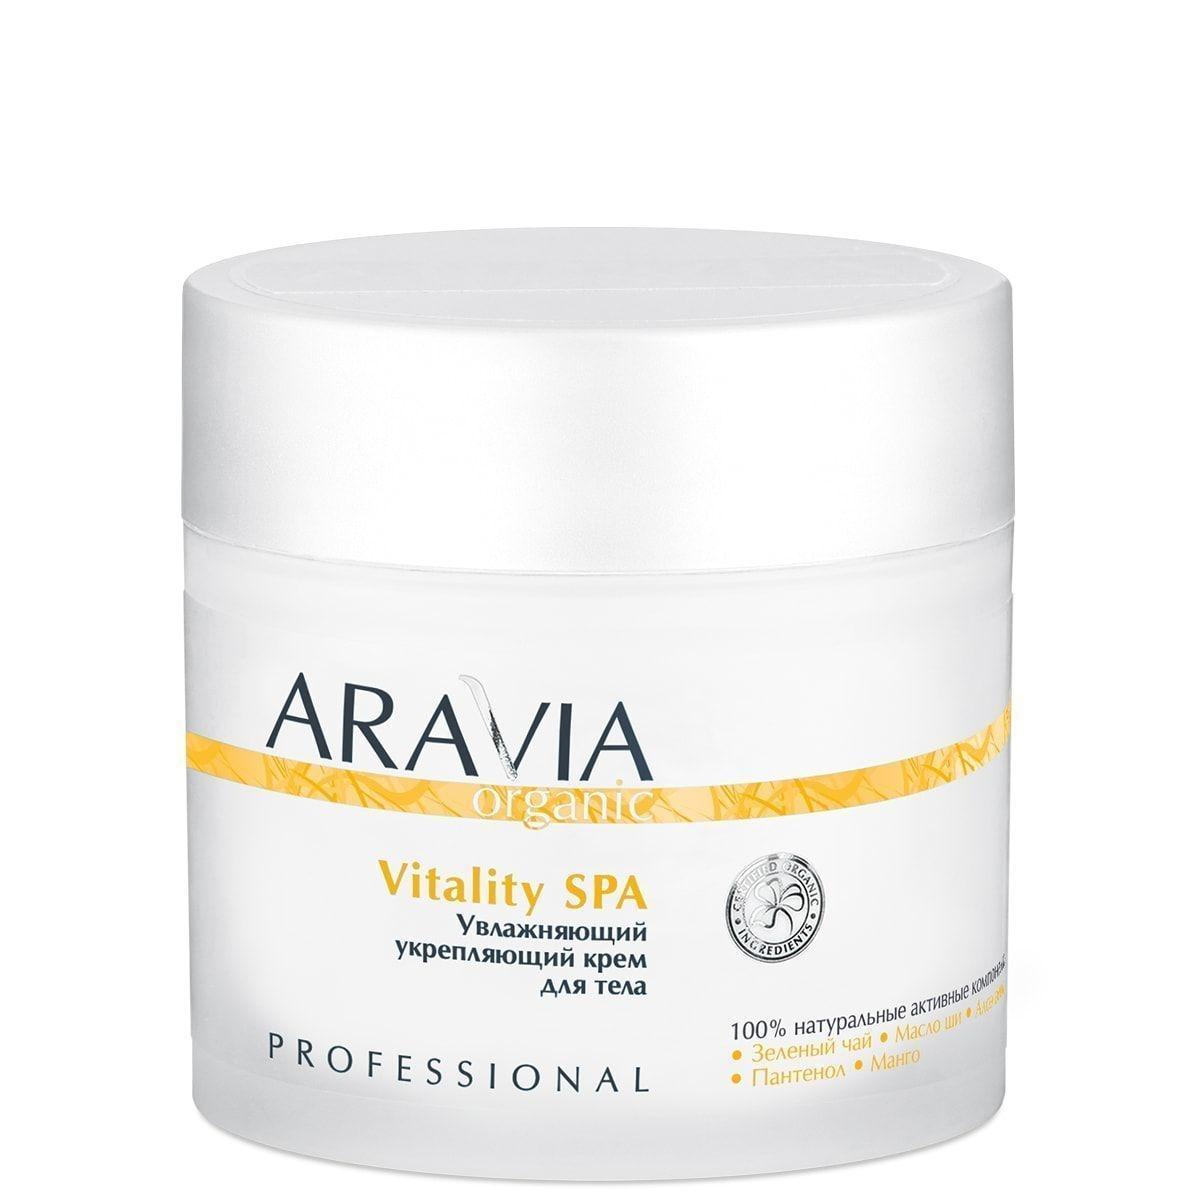 ARAVIA Organic Крем для Тела Увлажняющий Укрепляющий Vitality SPA, 300 мл